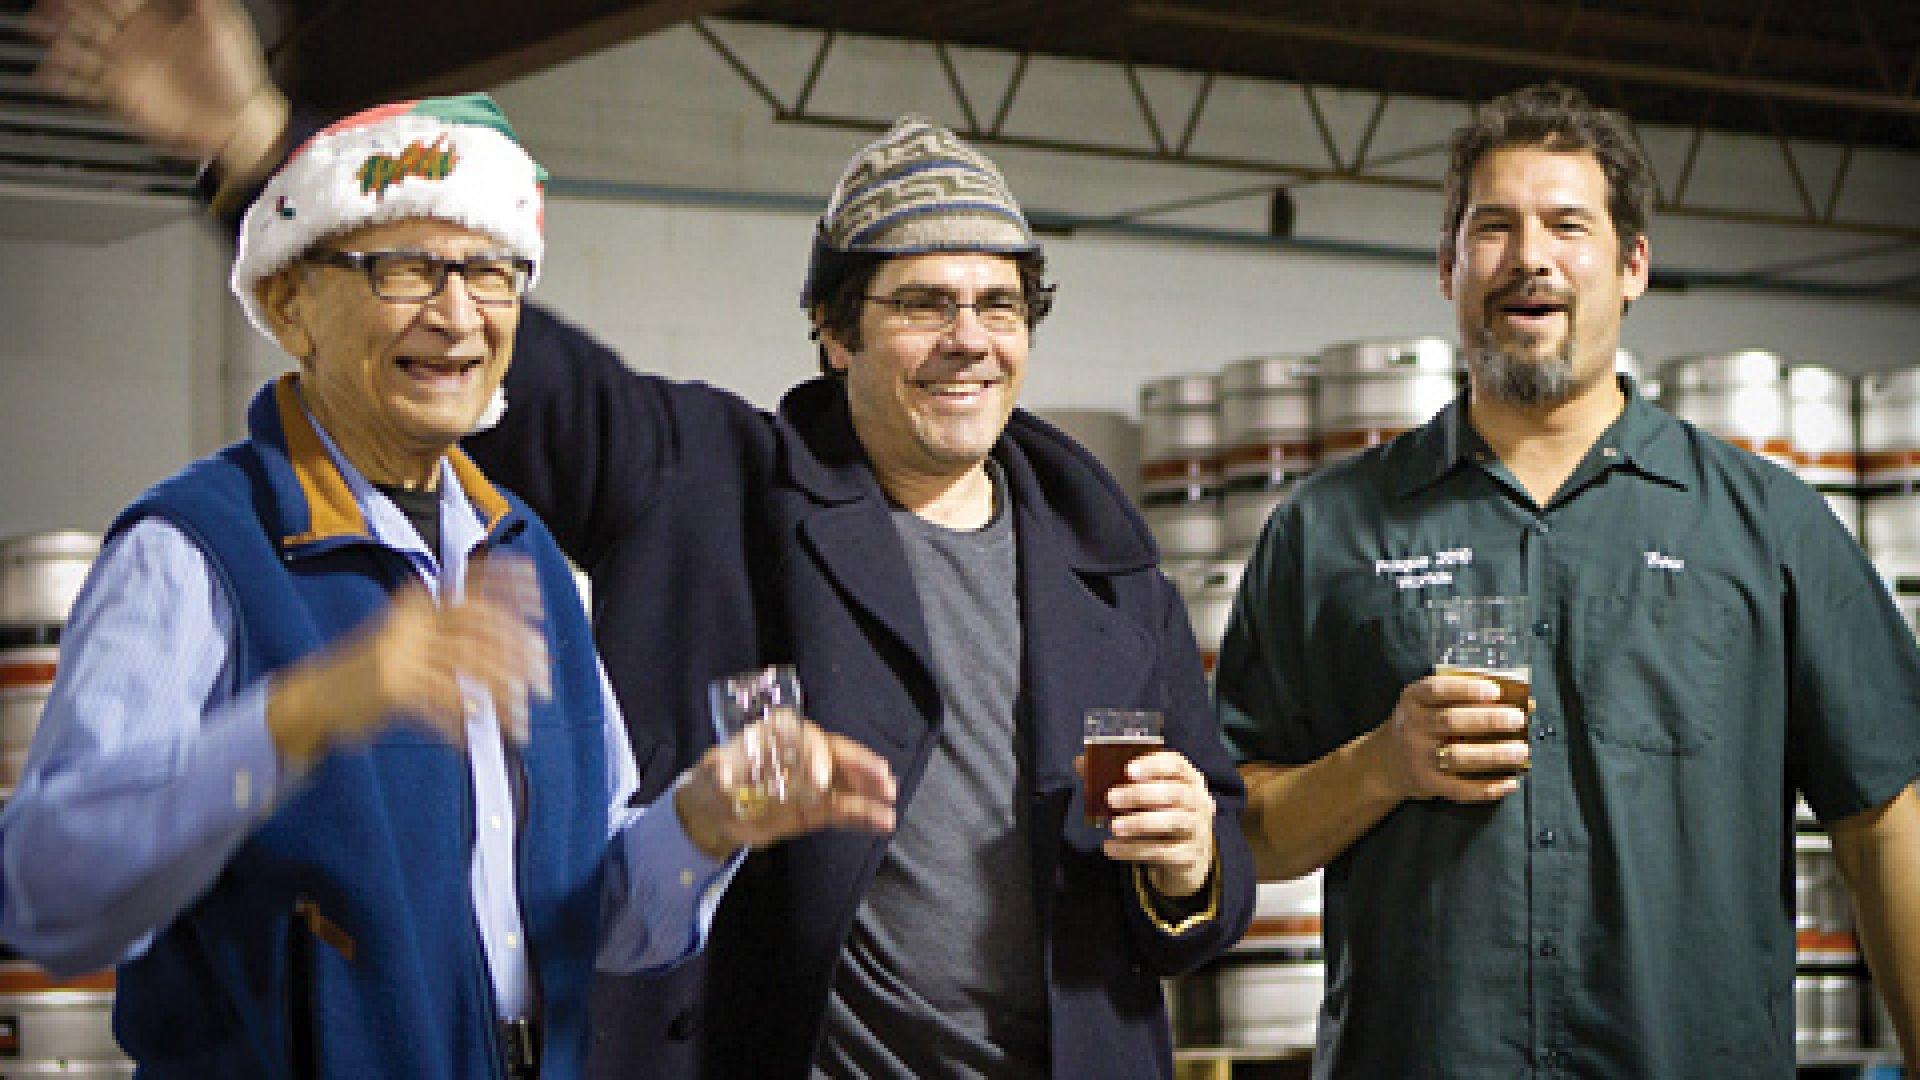 Omar Ansari (right) of Surly Brewing